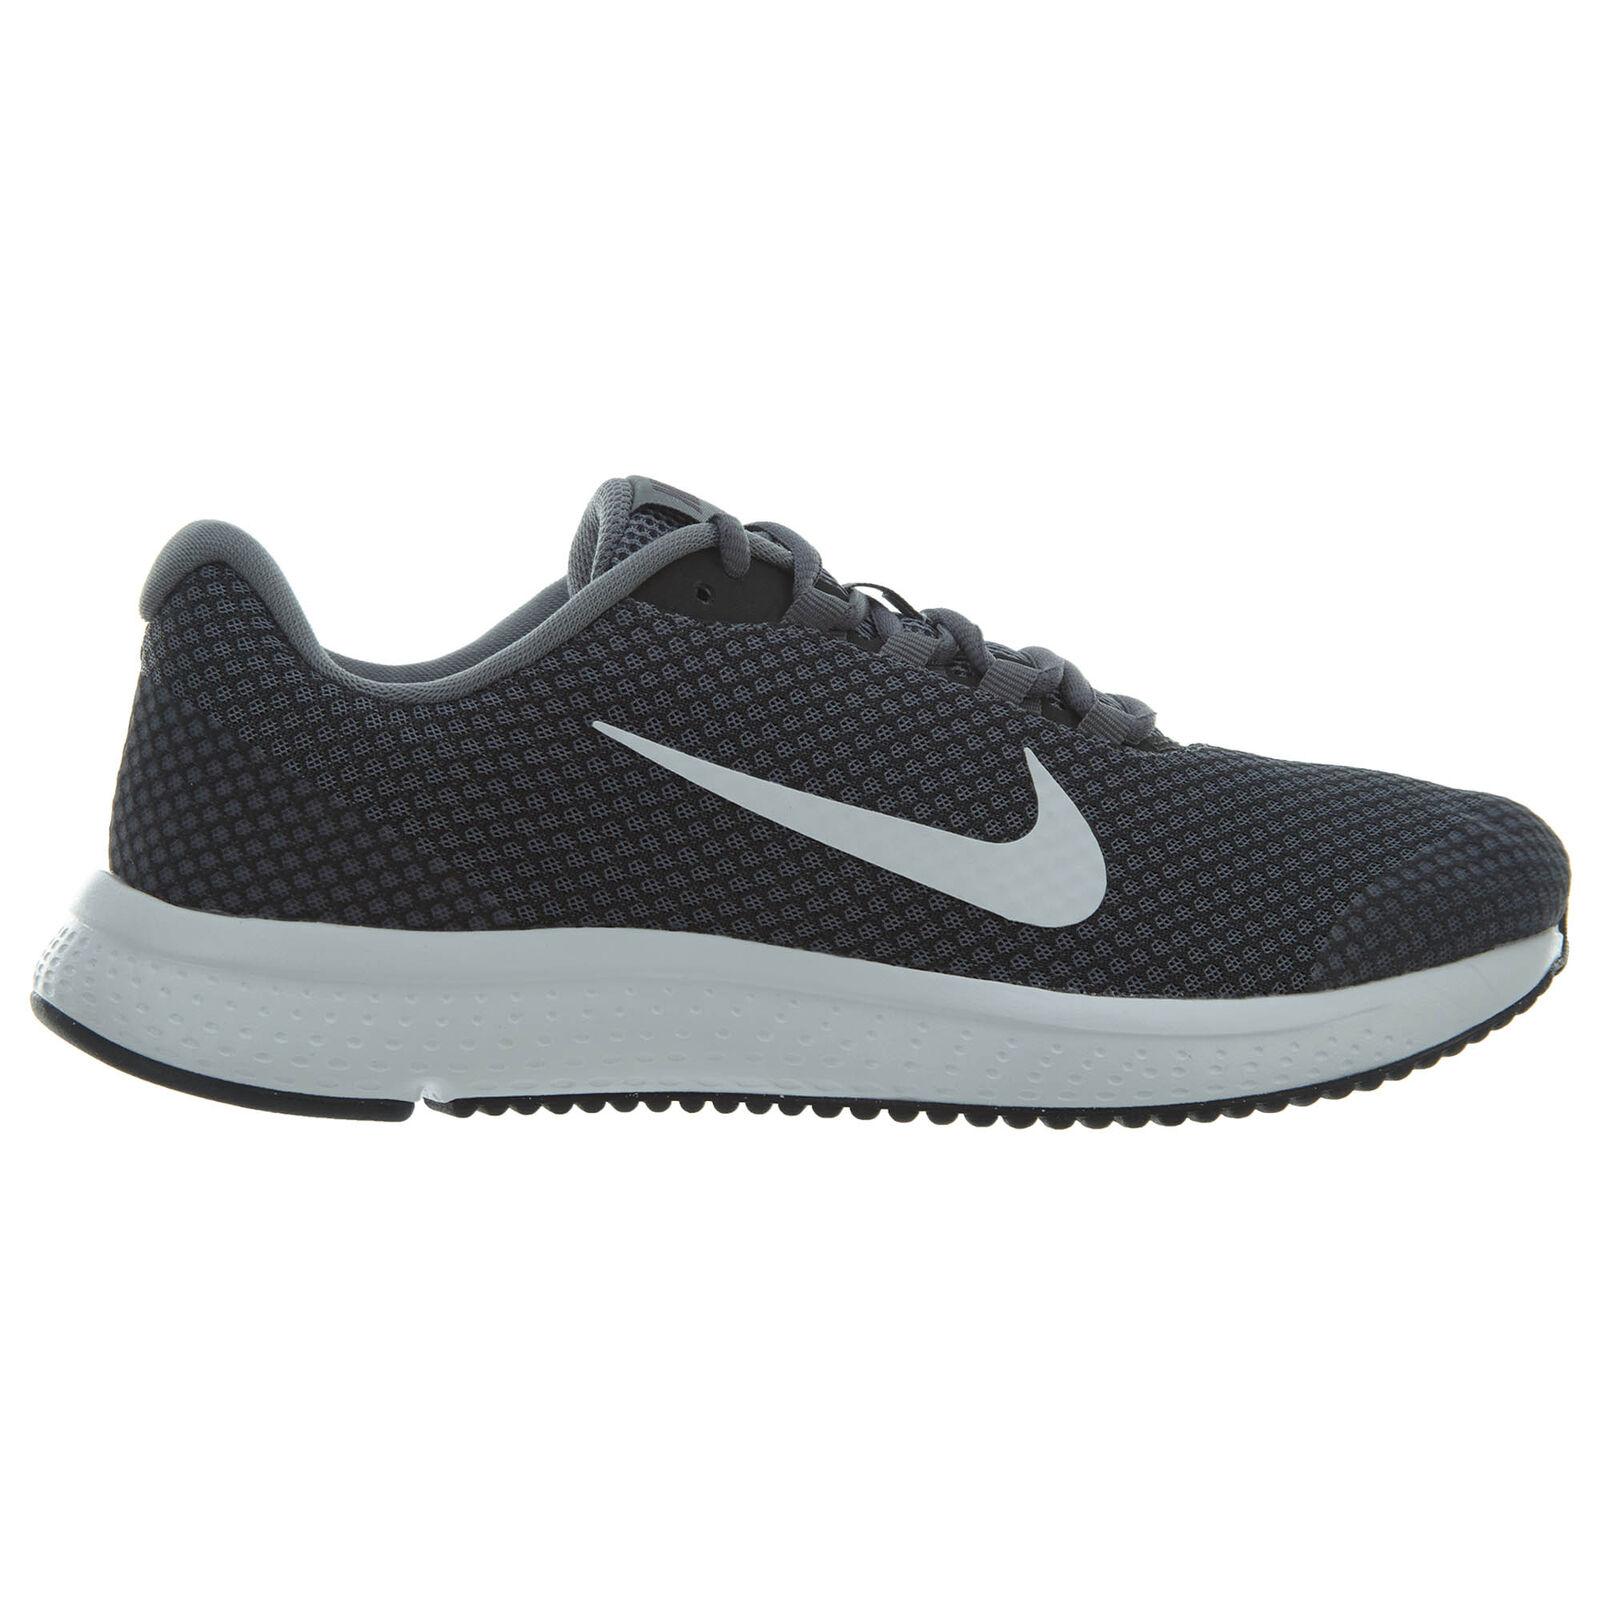 Nike Runallday Mens 898464-013 Cool Grey Mesh White Running shoes Size 8